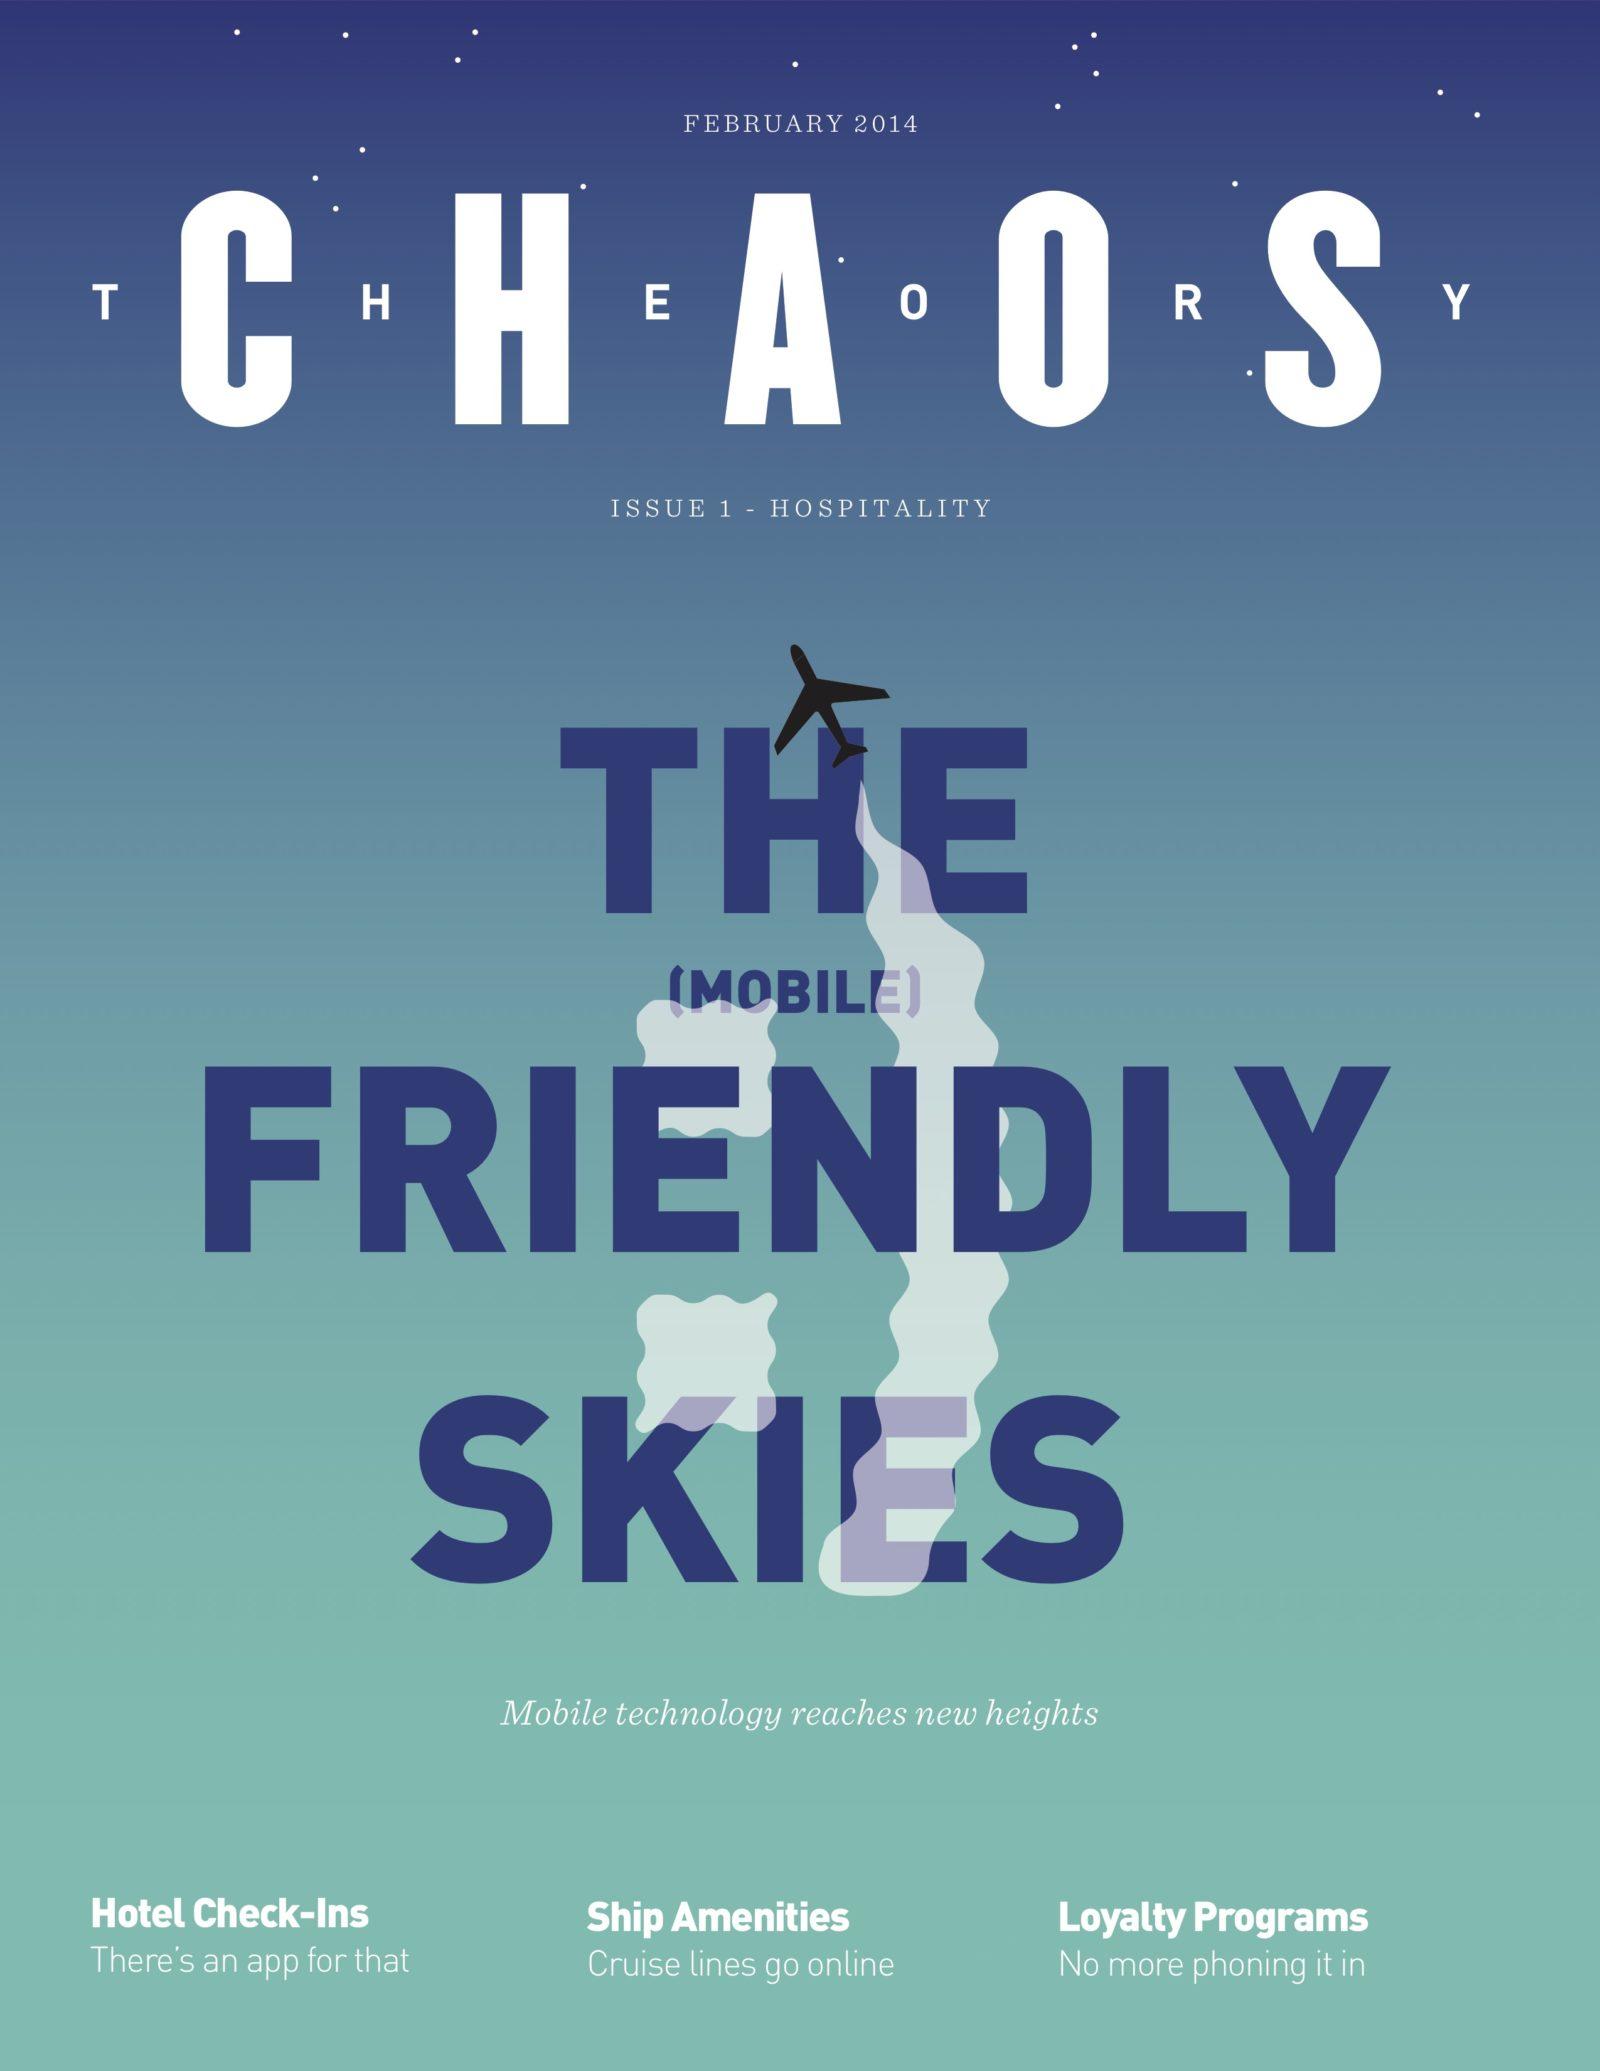 Portfolio_Chaostheory_hospitality